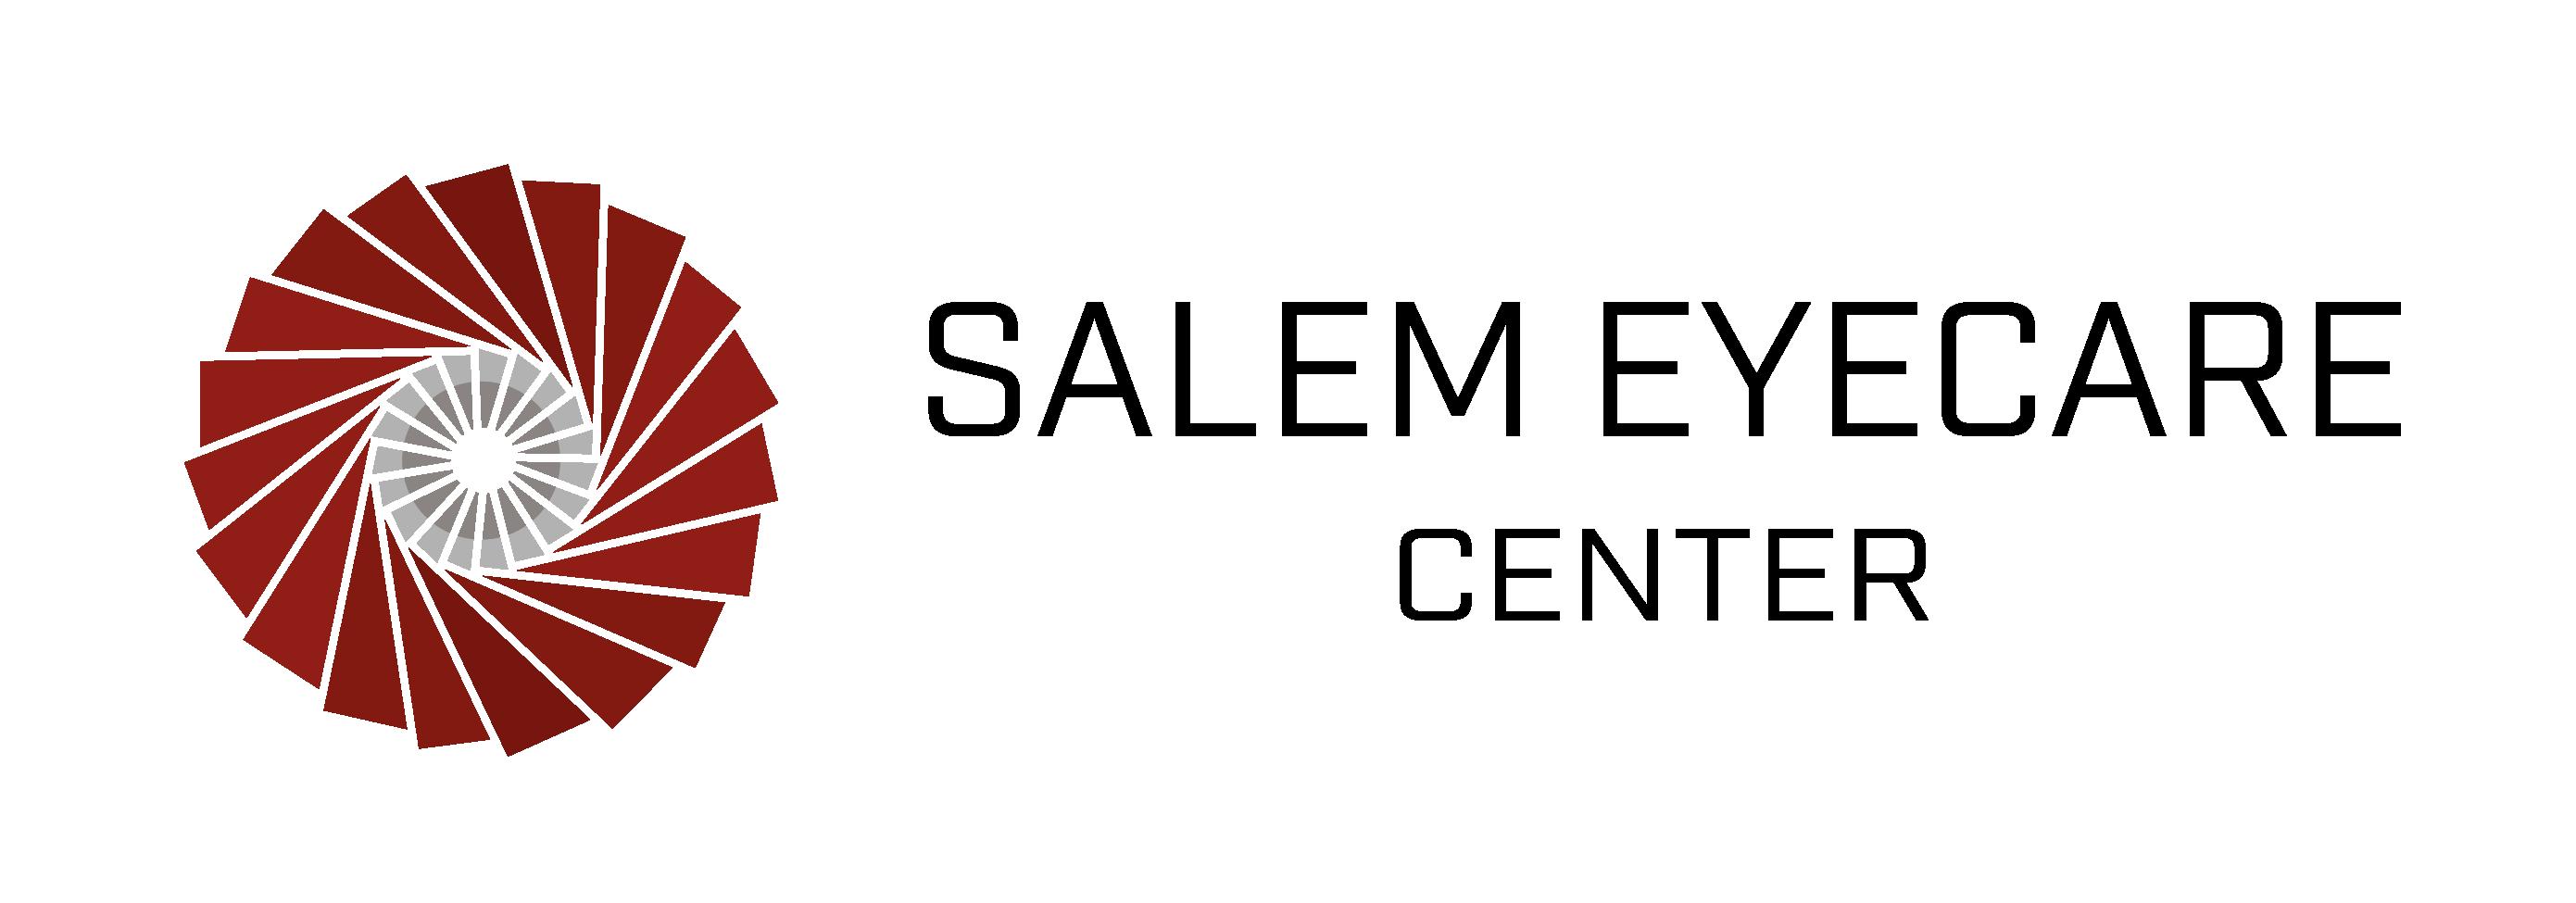 Salem Eyecare Center